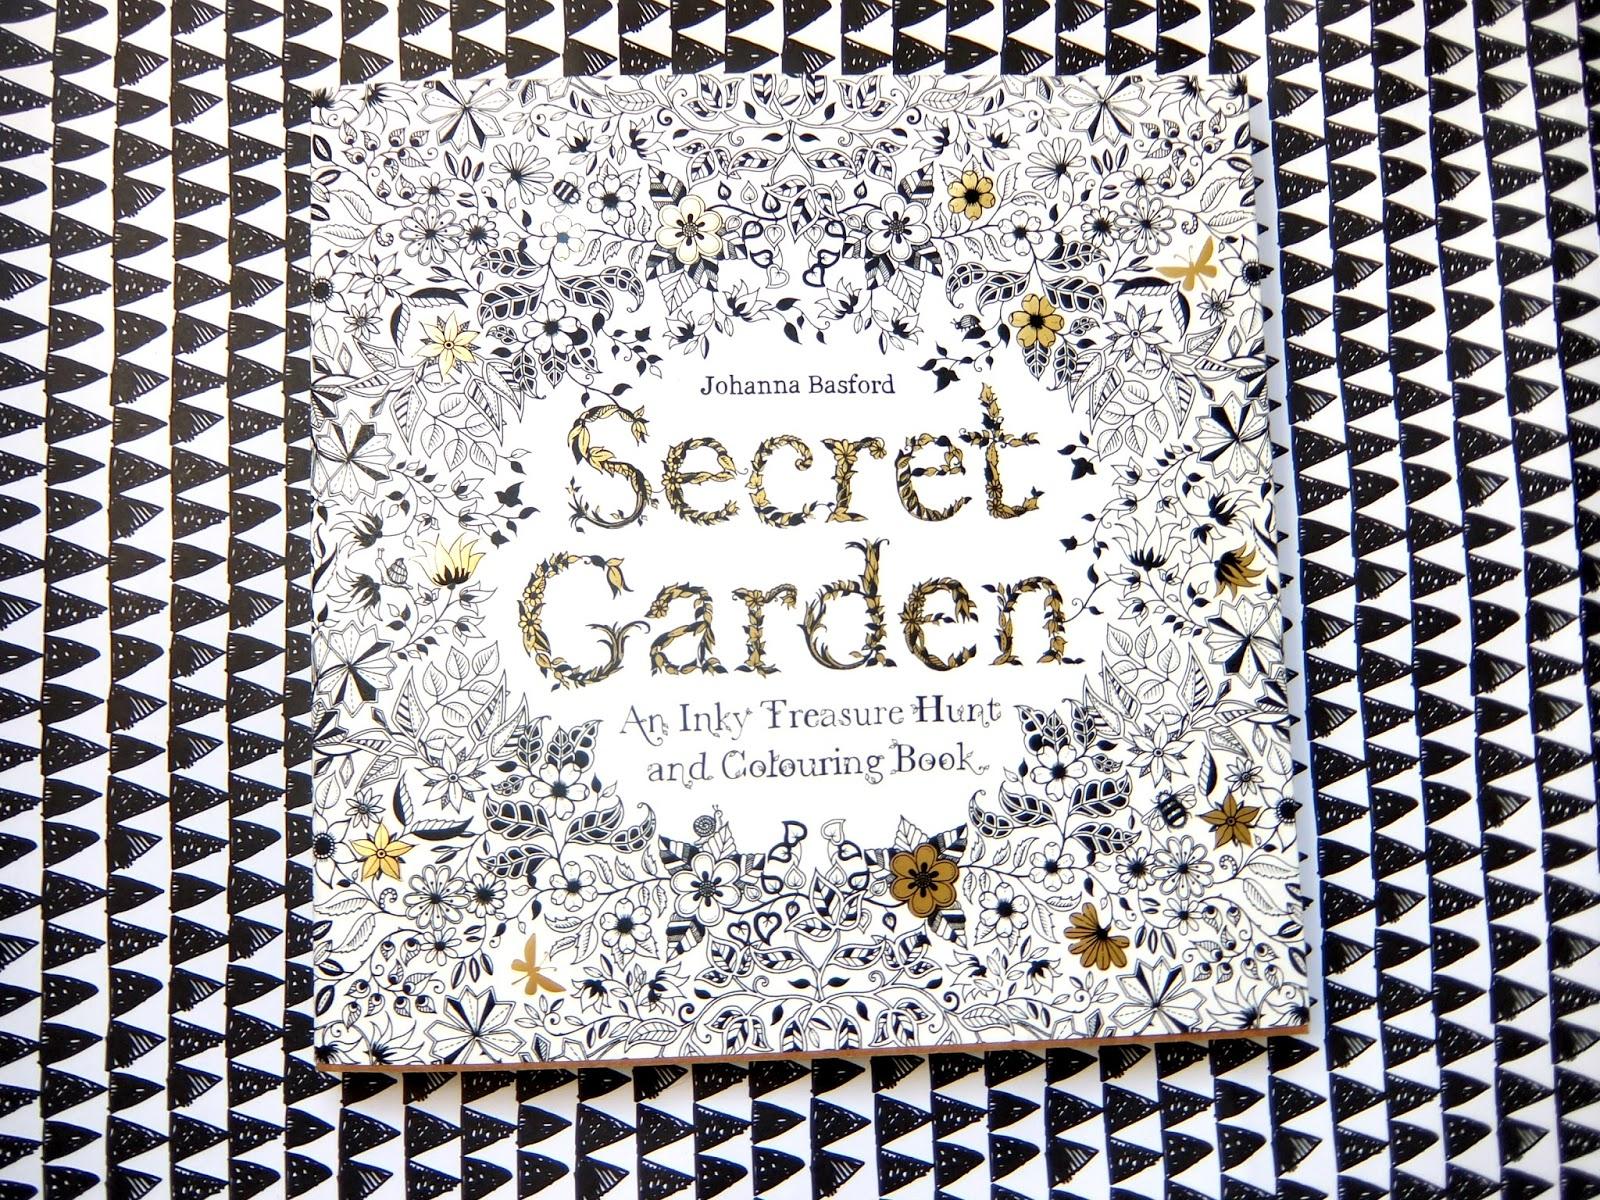 The secret garden coloring book review - The Secret Garden Coloring Book Review 84